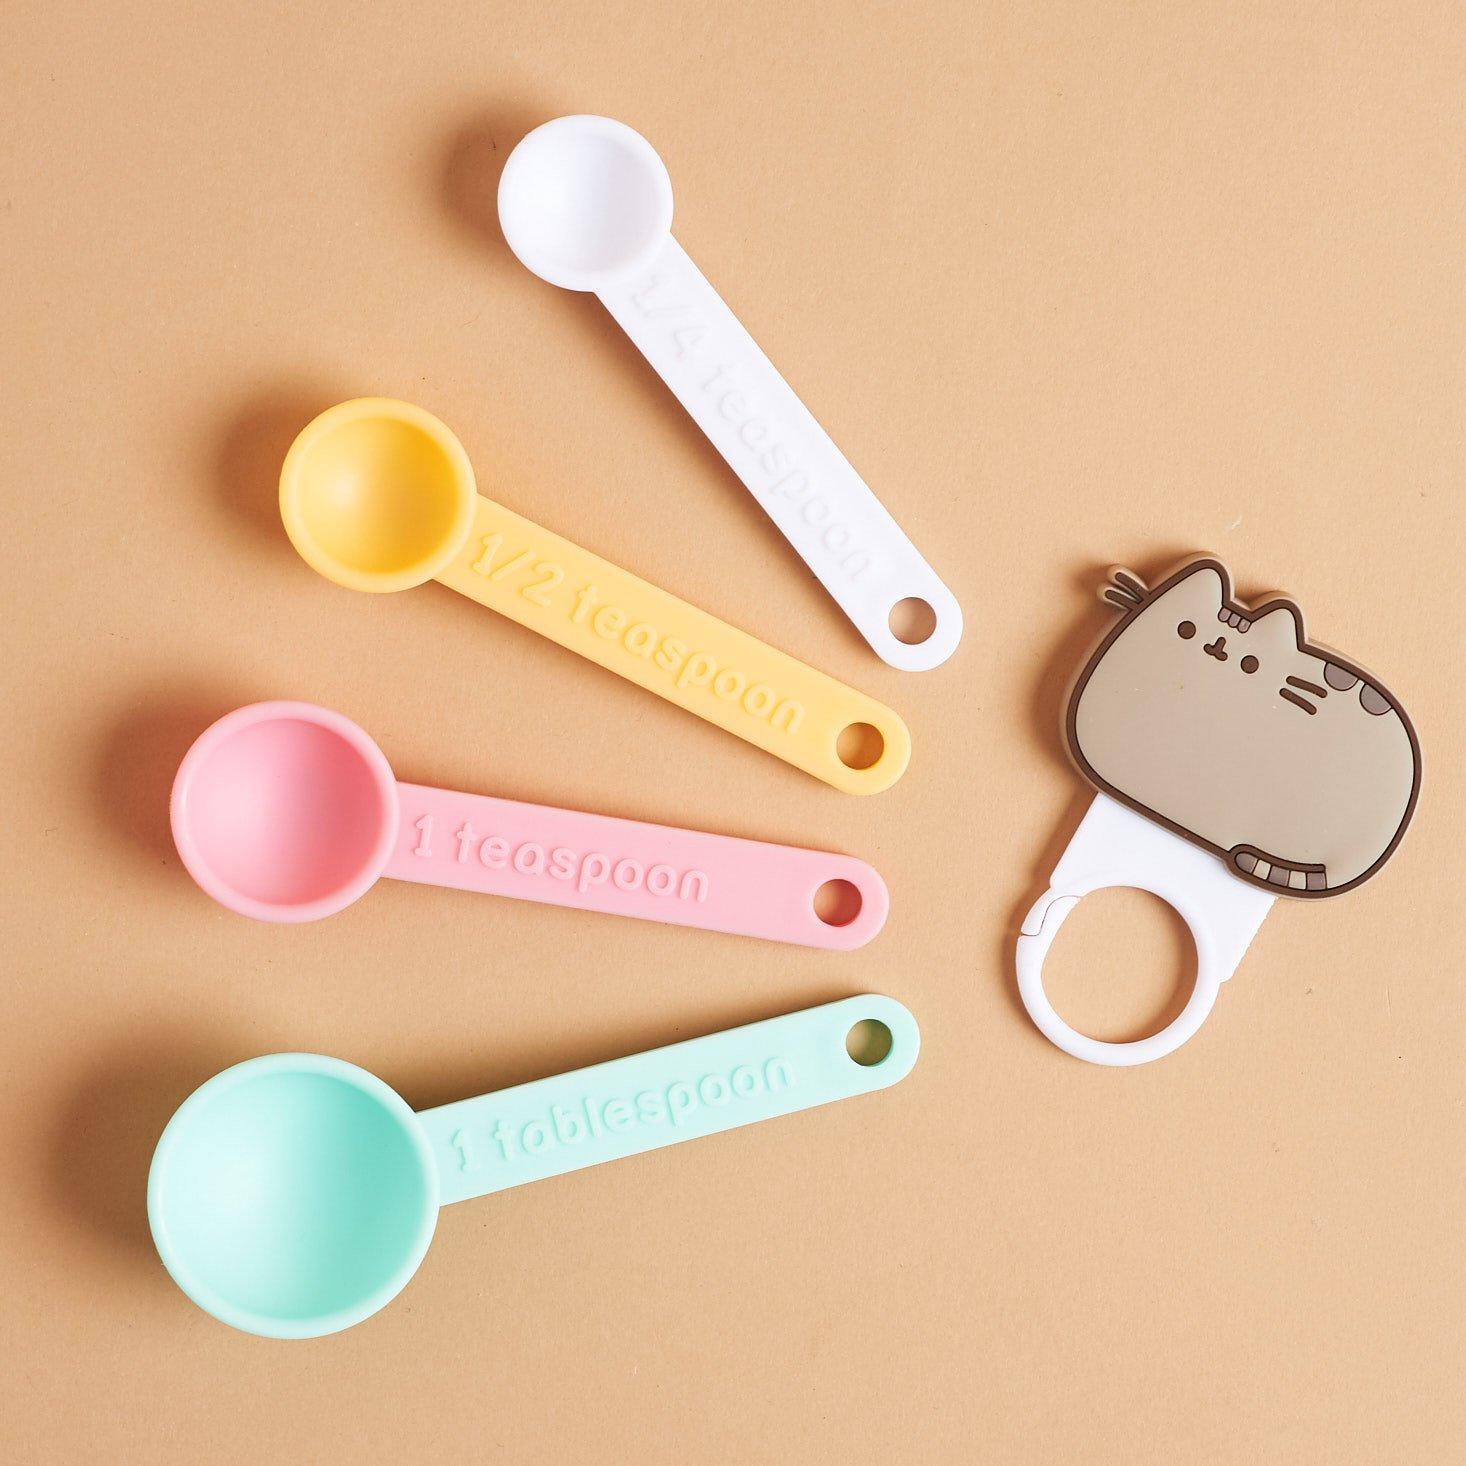 Pusheen Measuring spoon set - separated from ring